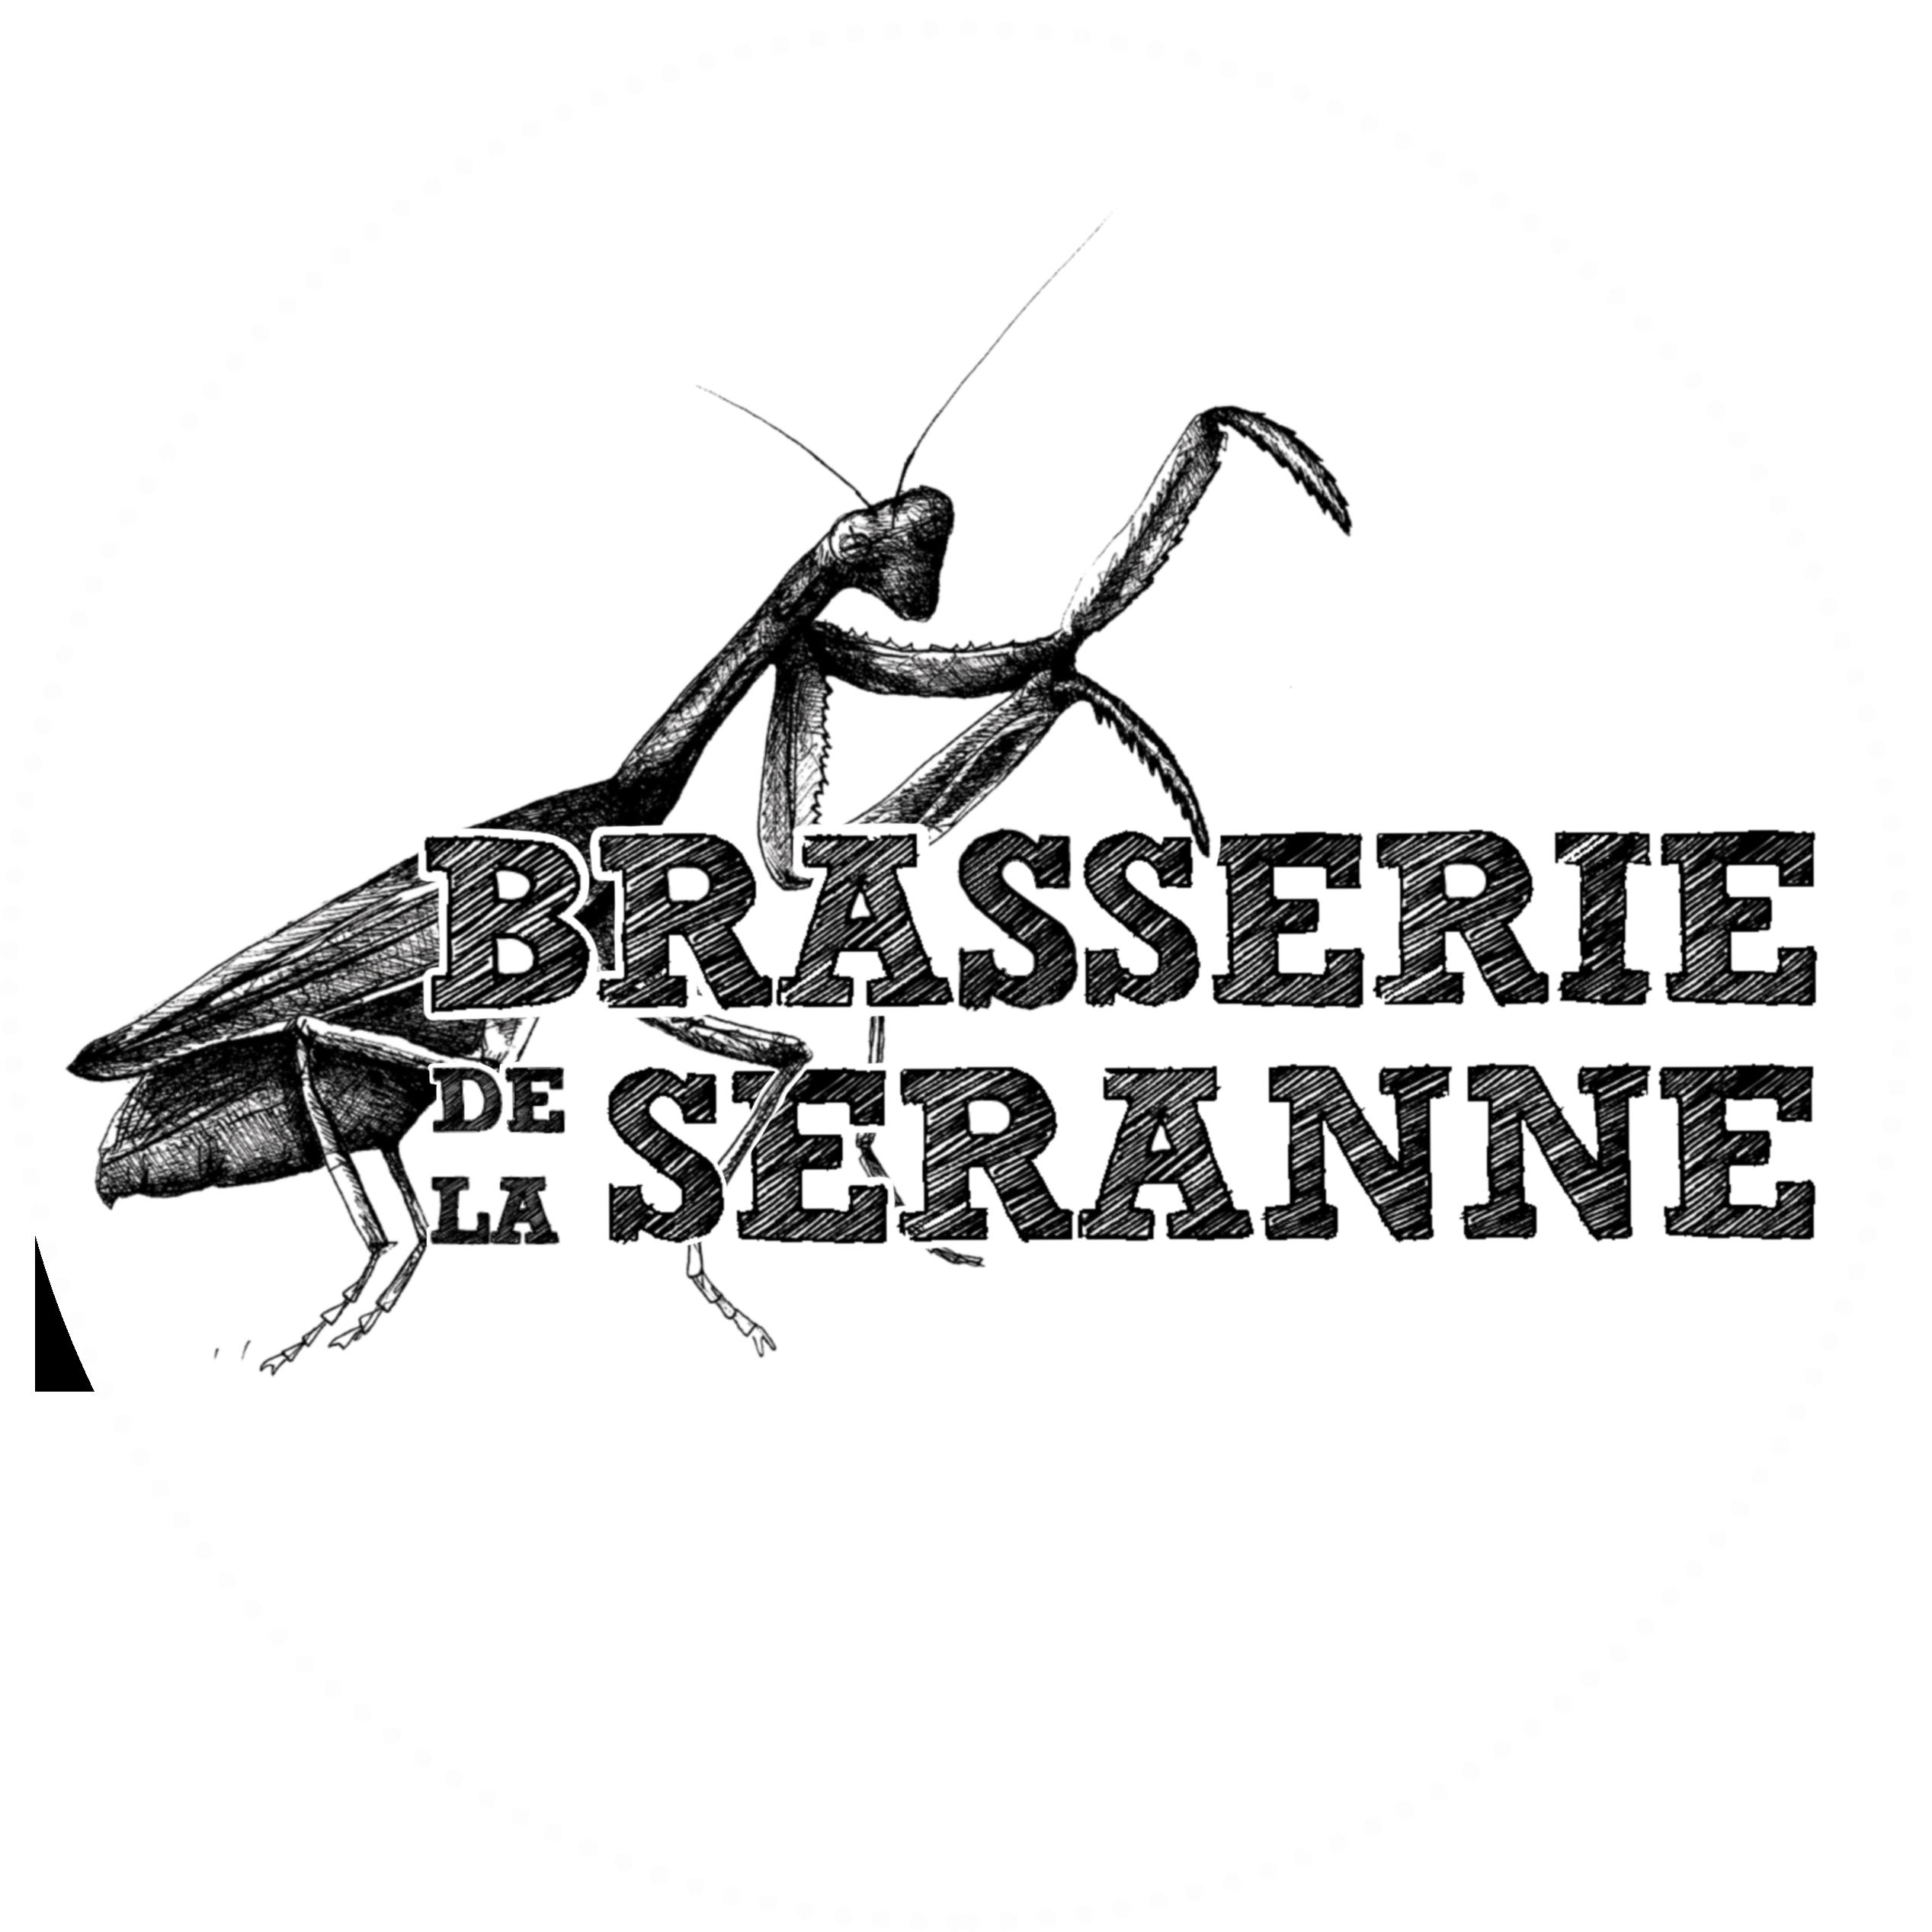 image_thumb_Brasserie de la Séranne